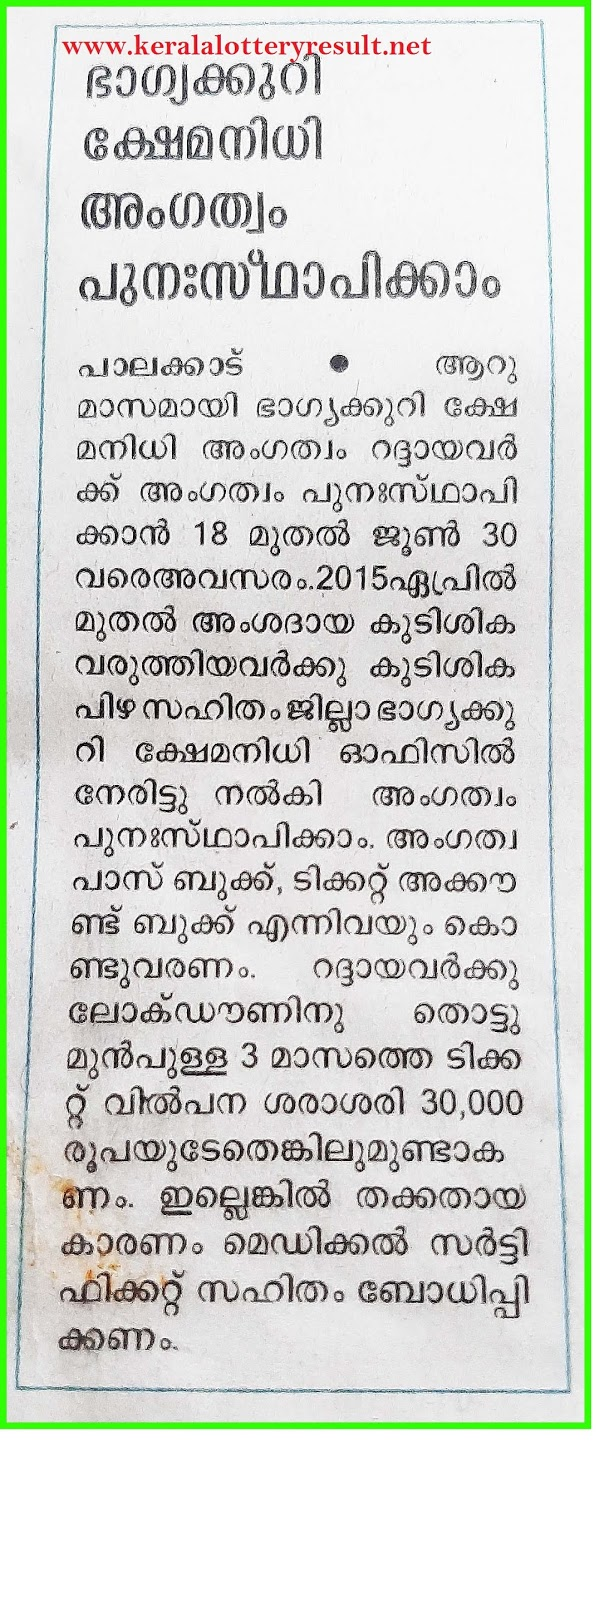 Kerala Lottery : Notification For Lottery agents  kerala lottery application form,  kerala lottery agent commission,  upcoming kerala lottery,  lotteries,  kerala lottery chart,  kara lottery,  department of lottery,  kerala super lottery,